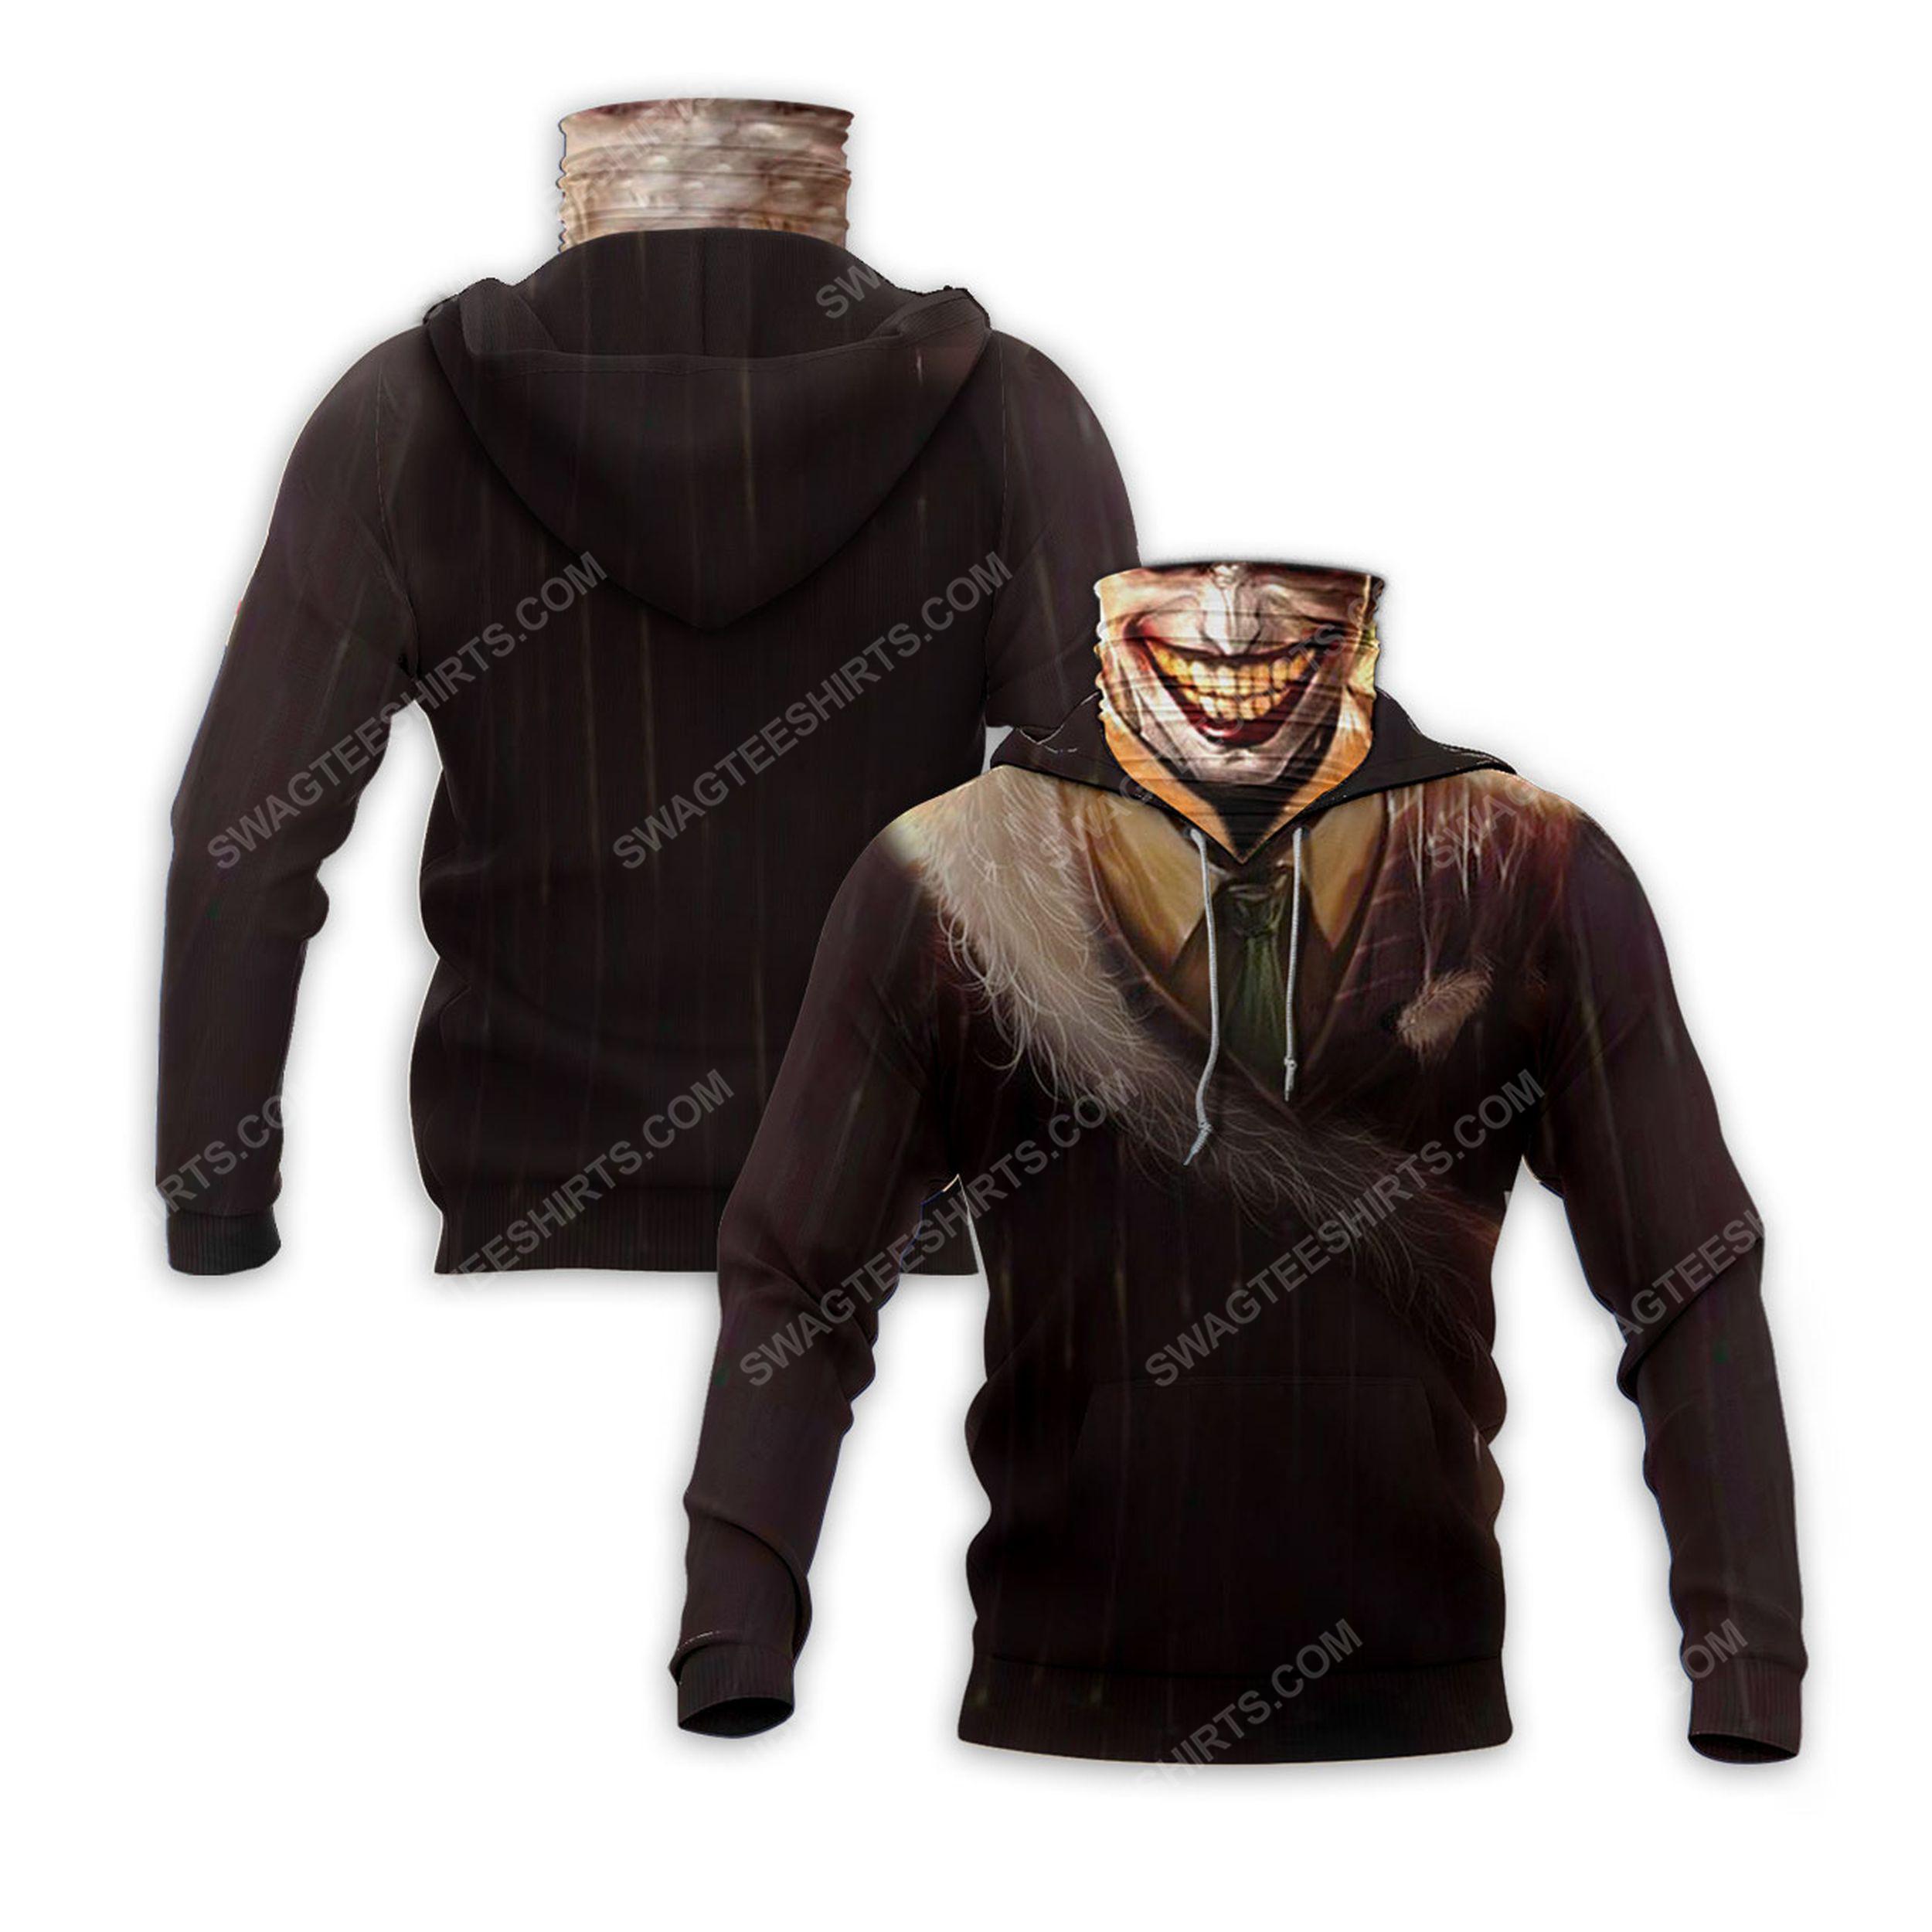 The joker's smile full print mask hoodie 2(1) - Copy